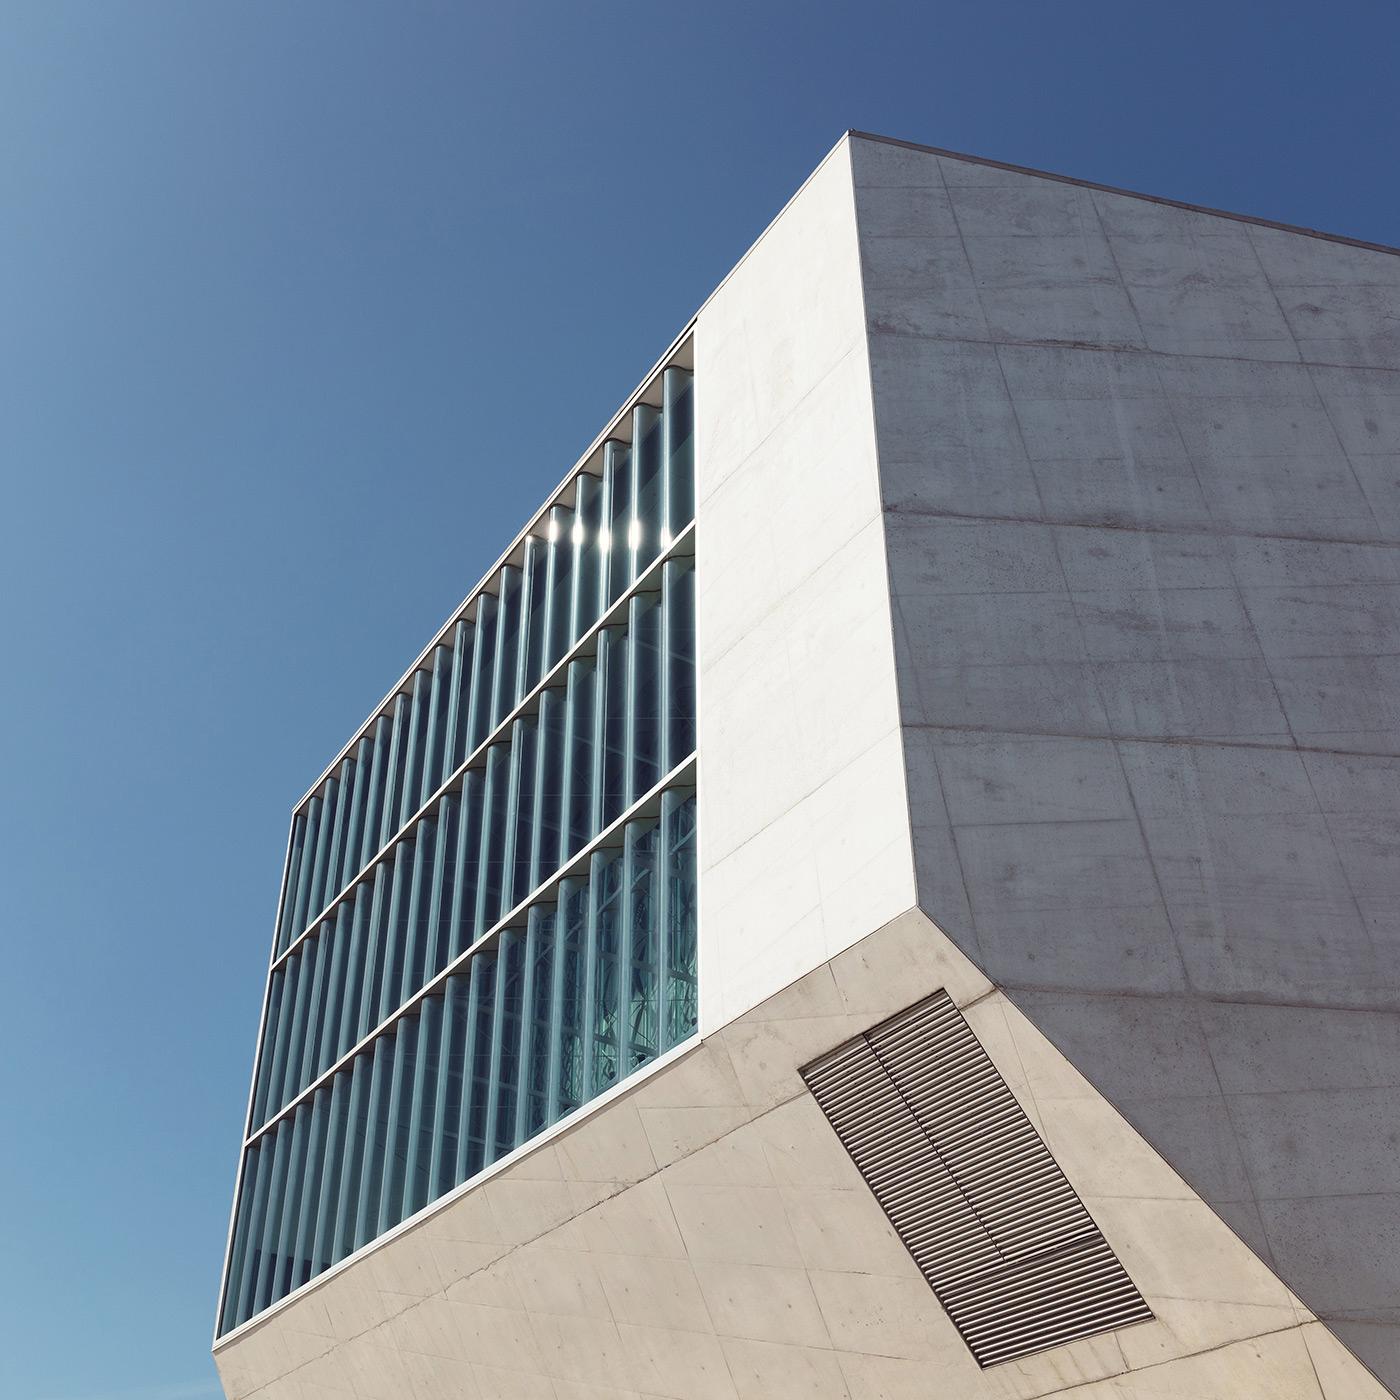 Casa da Música Location: Porto, Portugal Architects: OMA (Rem Koolhaas & Ellen Van Loon)